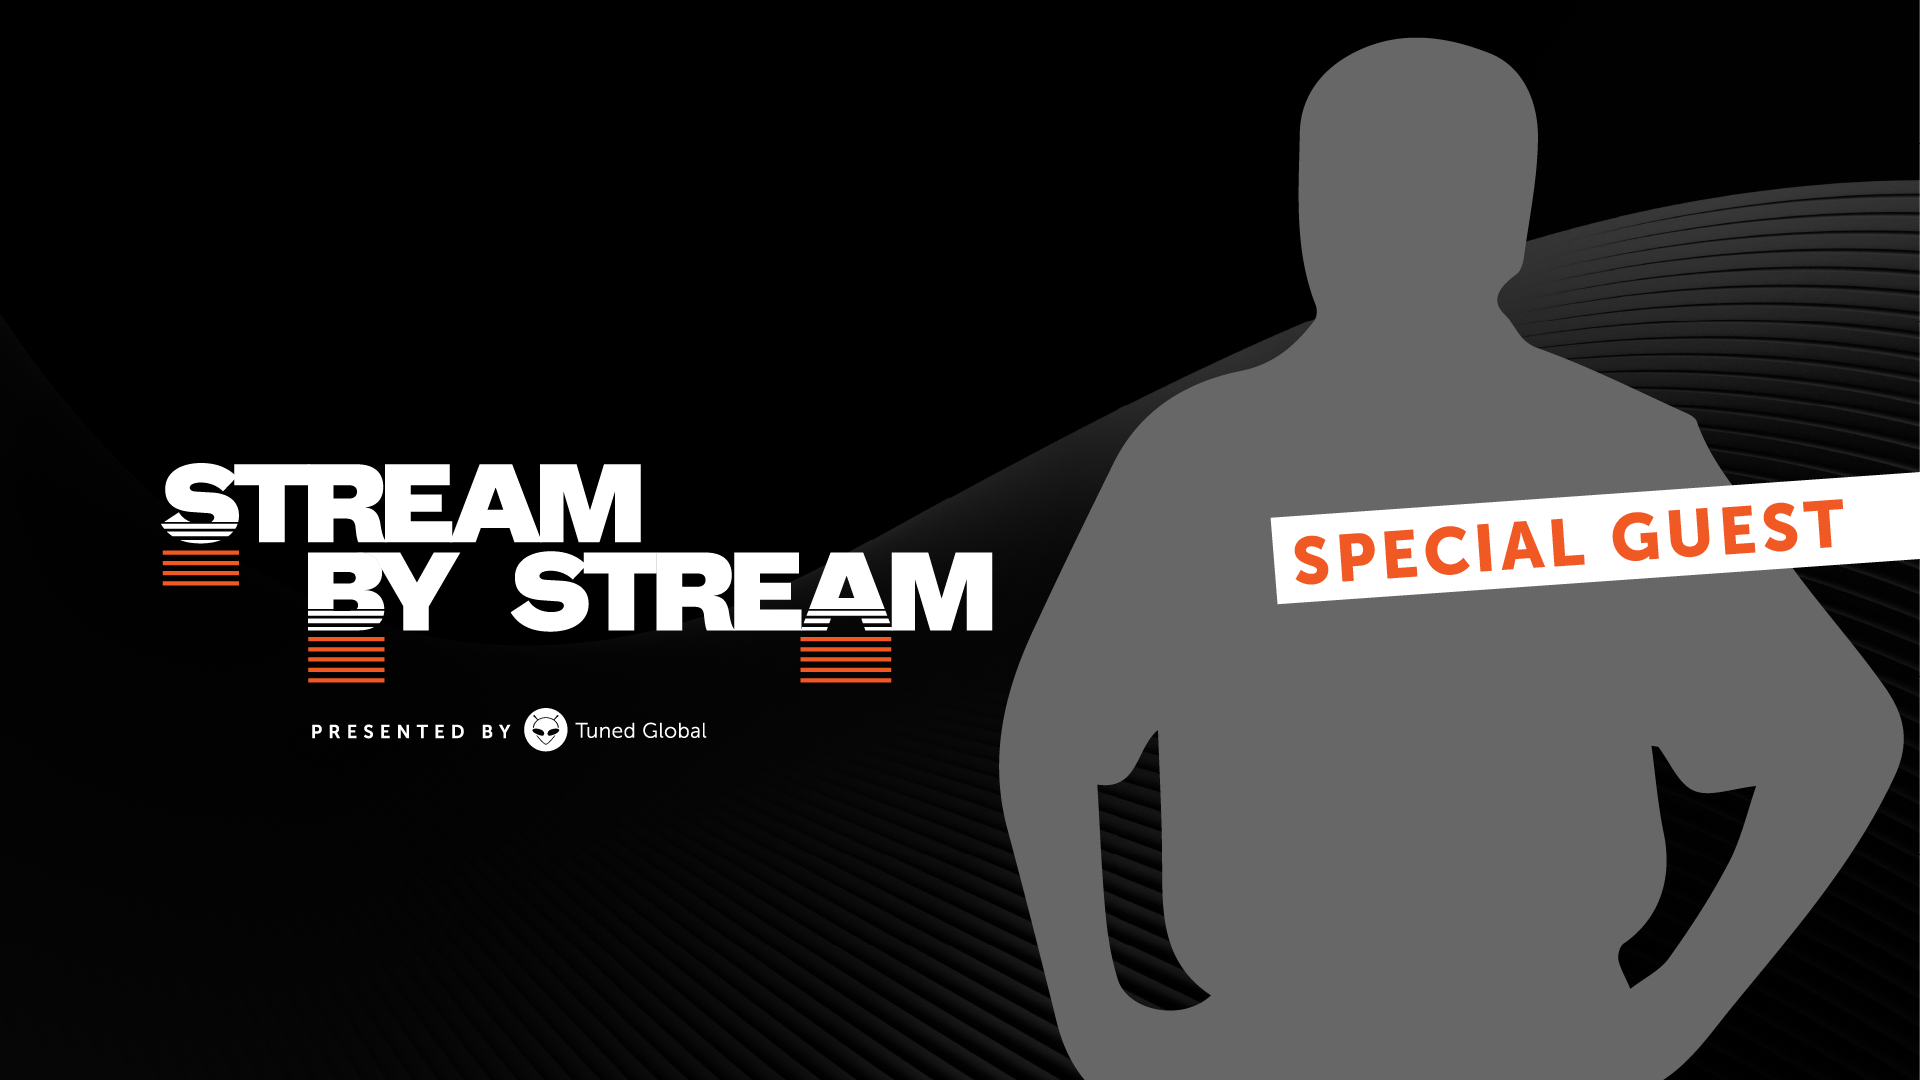 StreambyStream-guest-male